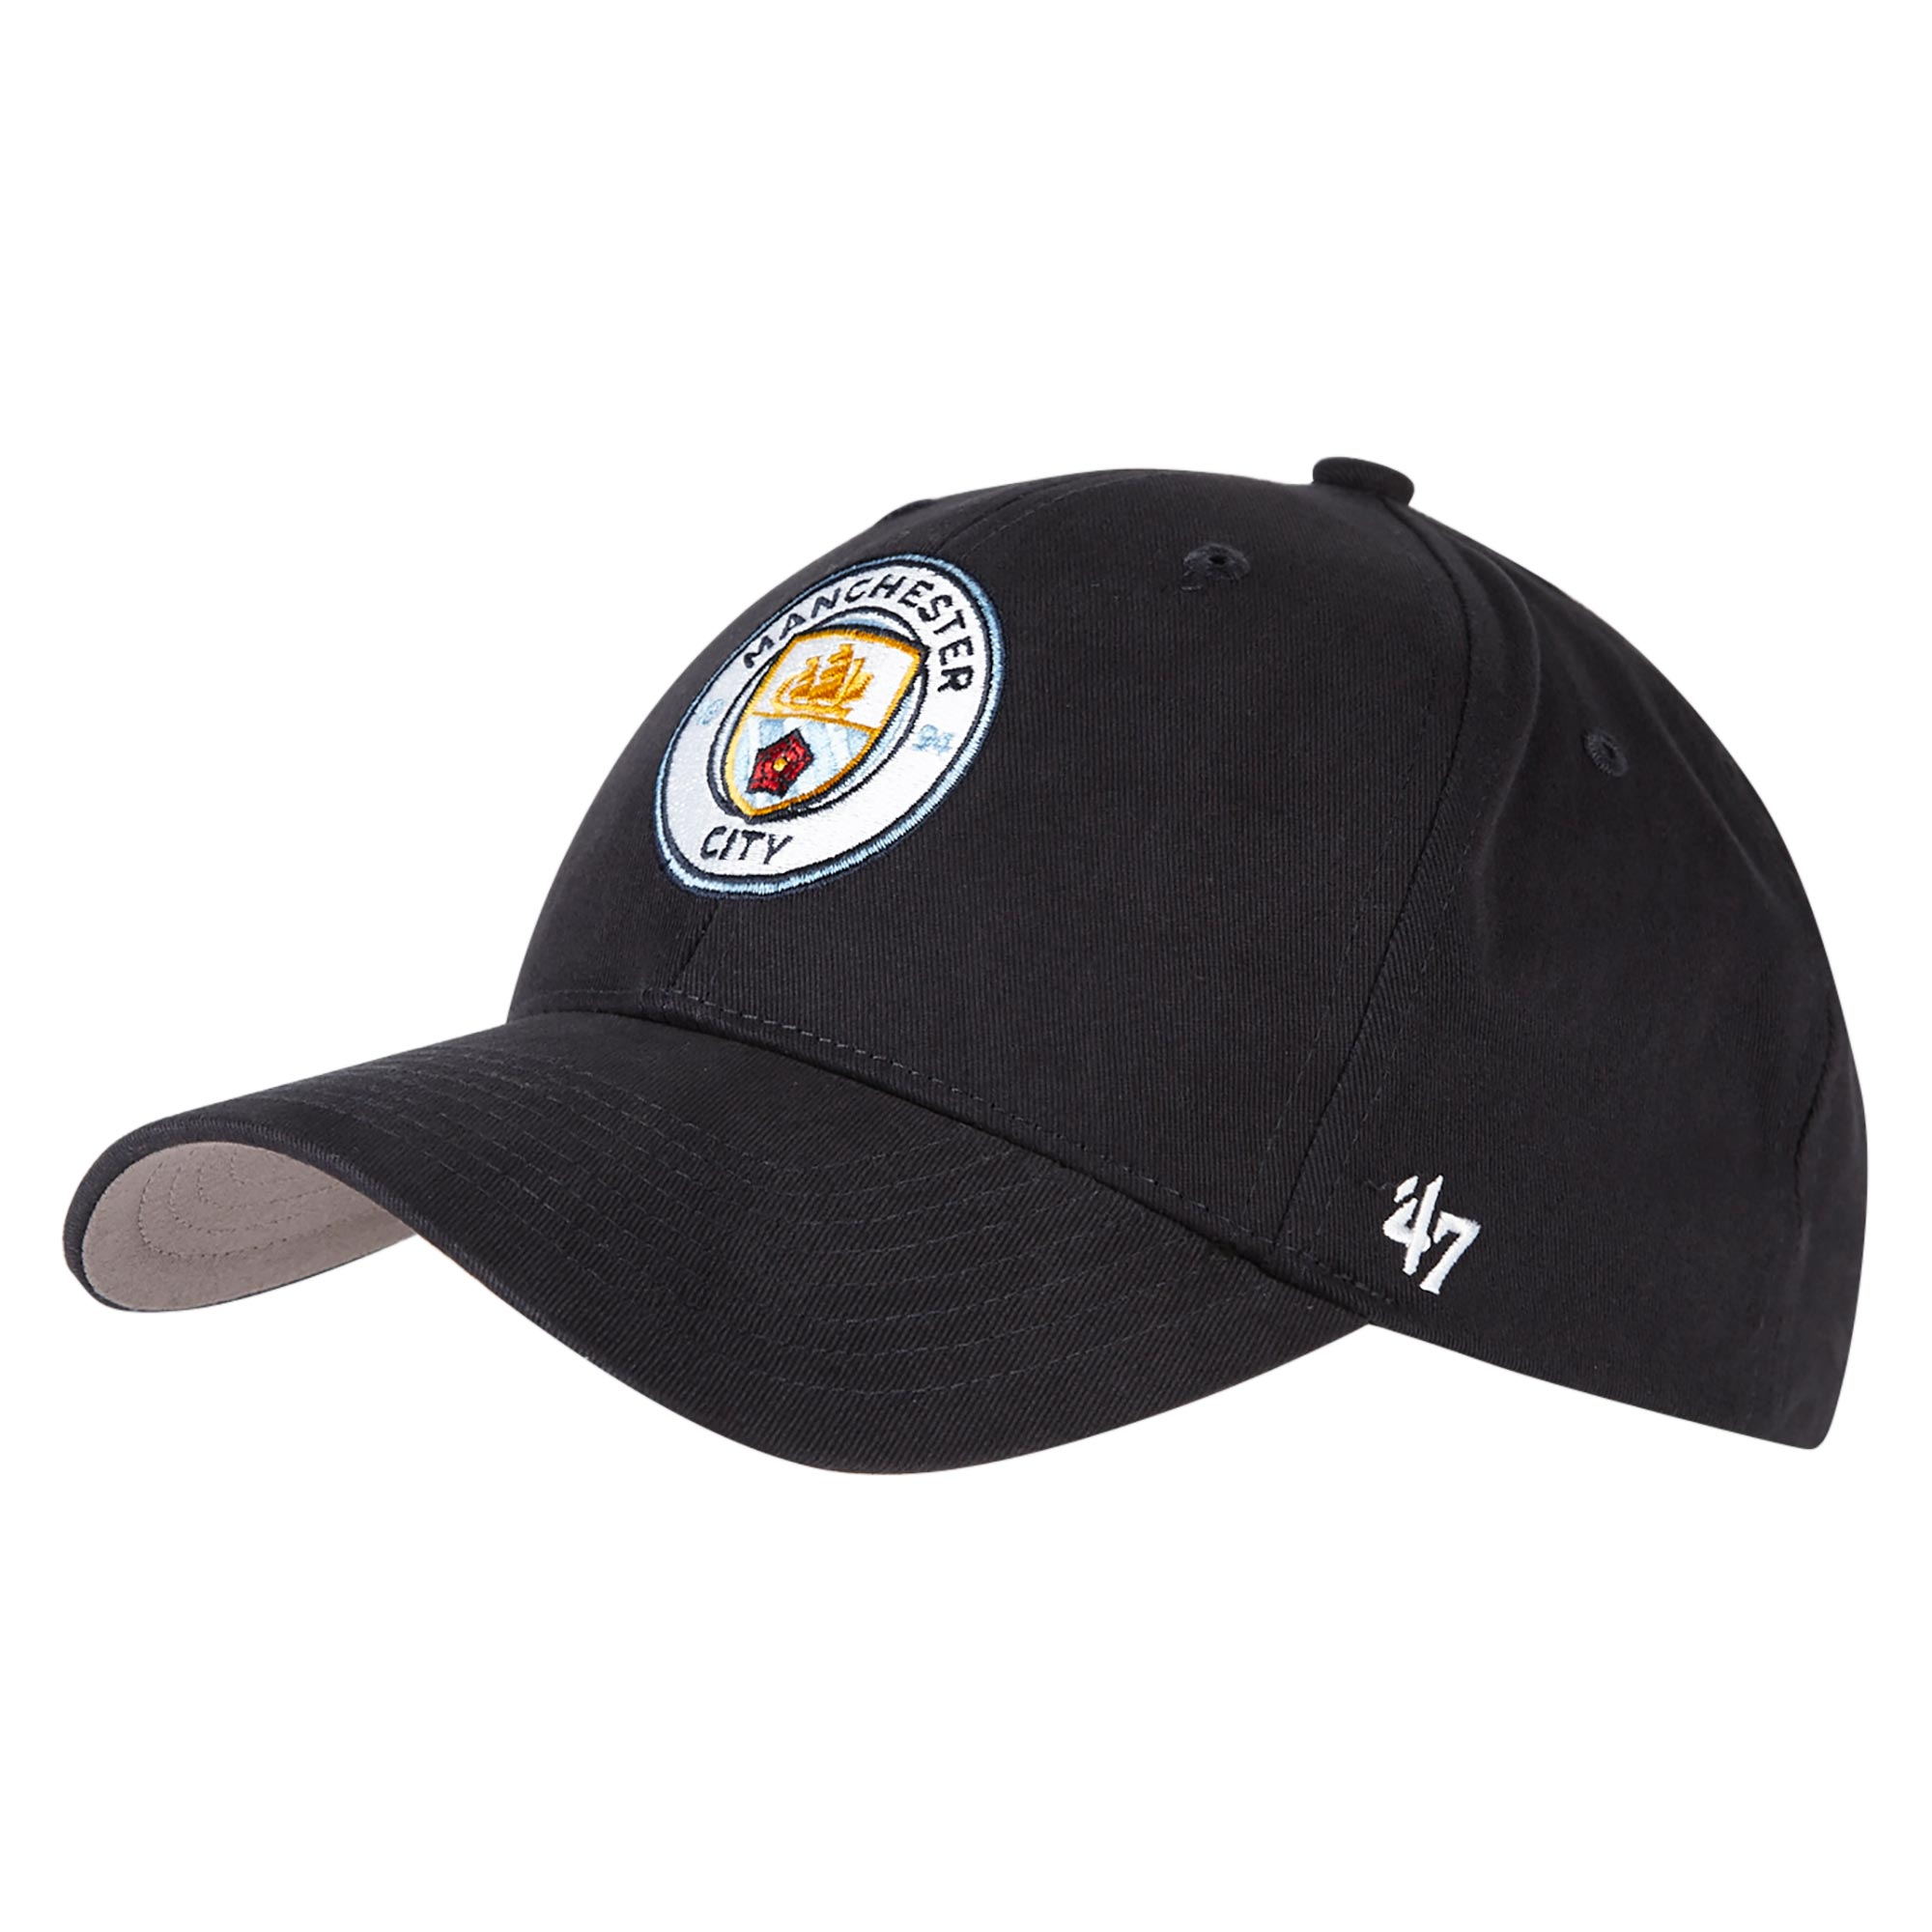 Manchester City 47 MVP Cap - Navy